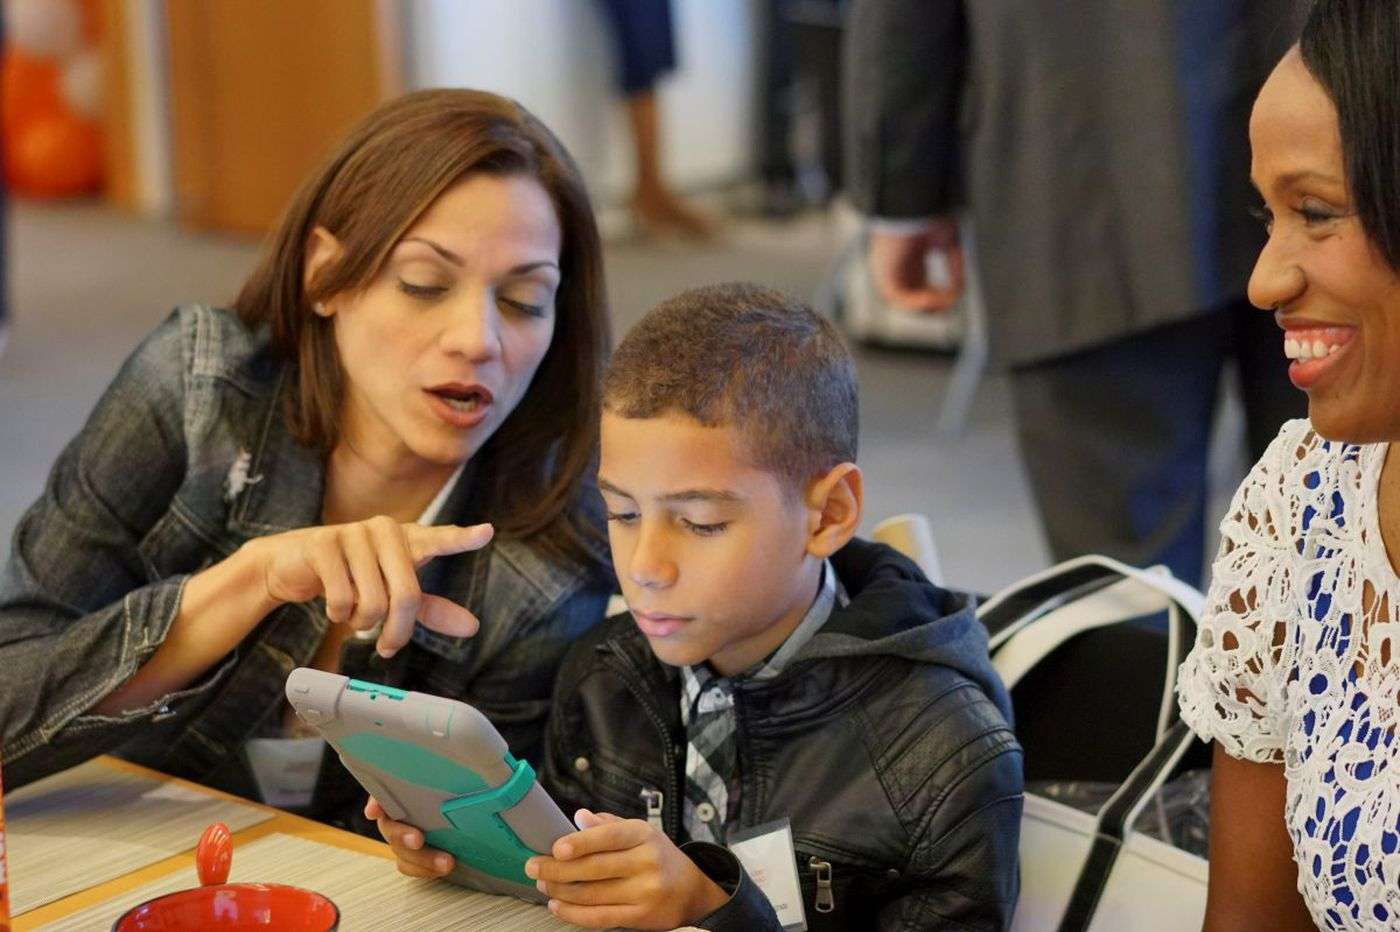 Comcast's low-cost internet program signs up 1 million families